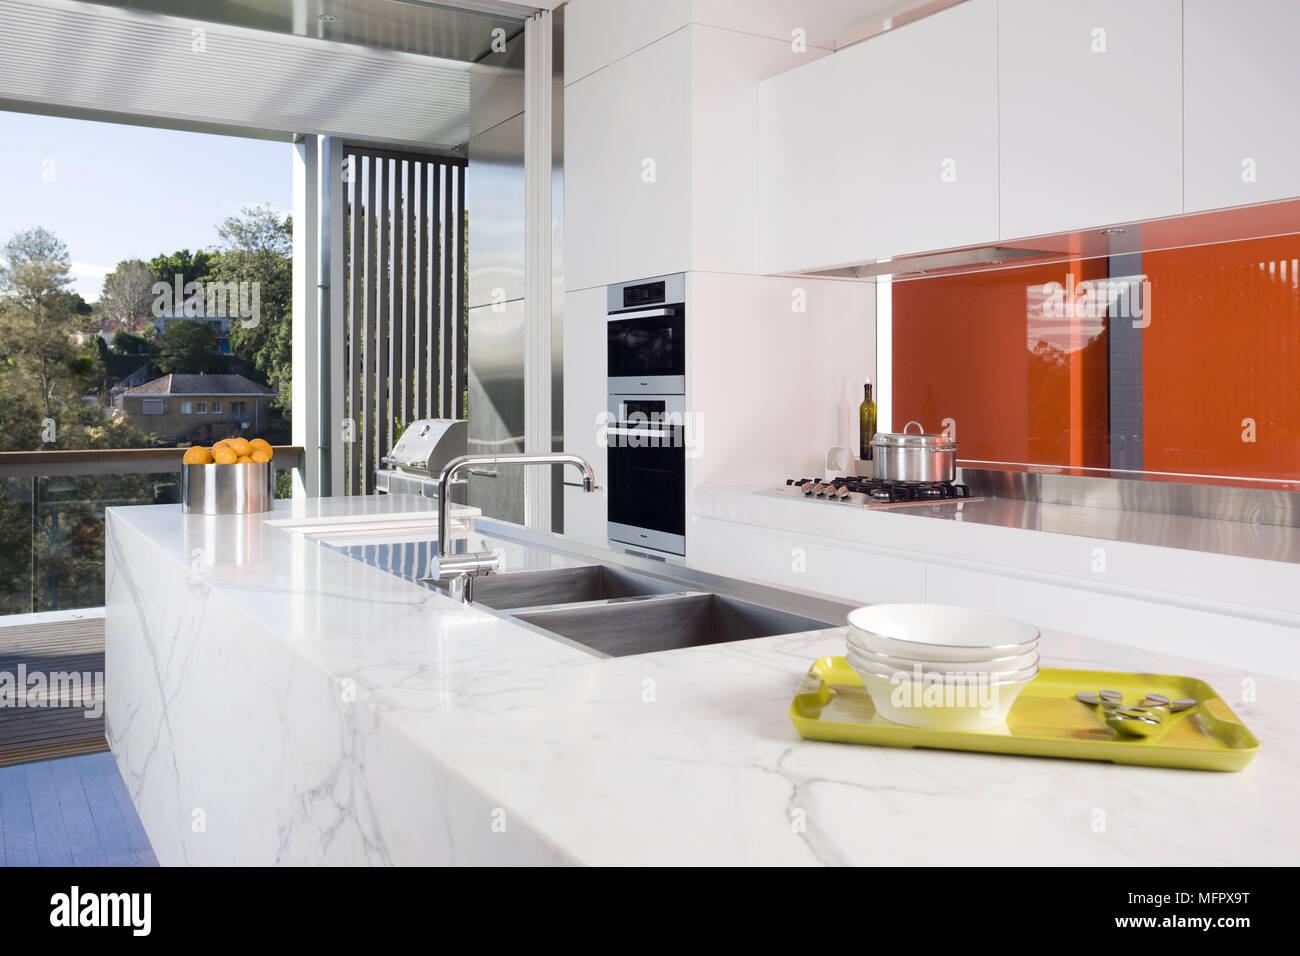 Conjunto Dissipador Na Unidade Central Na Moderna Cozinha Branca